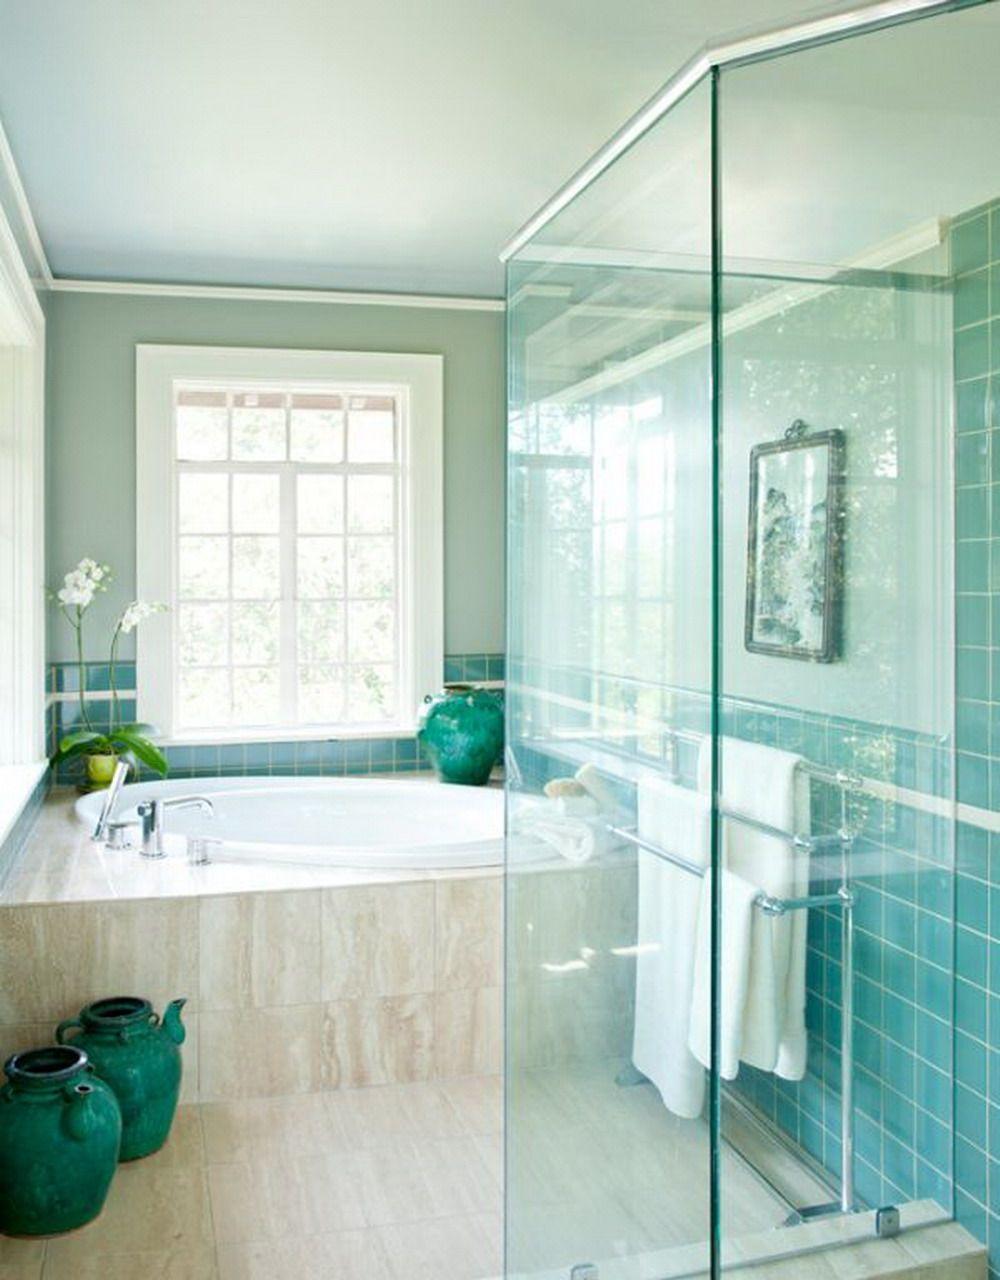 Garry Mertins | Garry Mertins Design, Inc. | Pinterest | Master bath ...